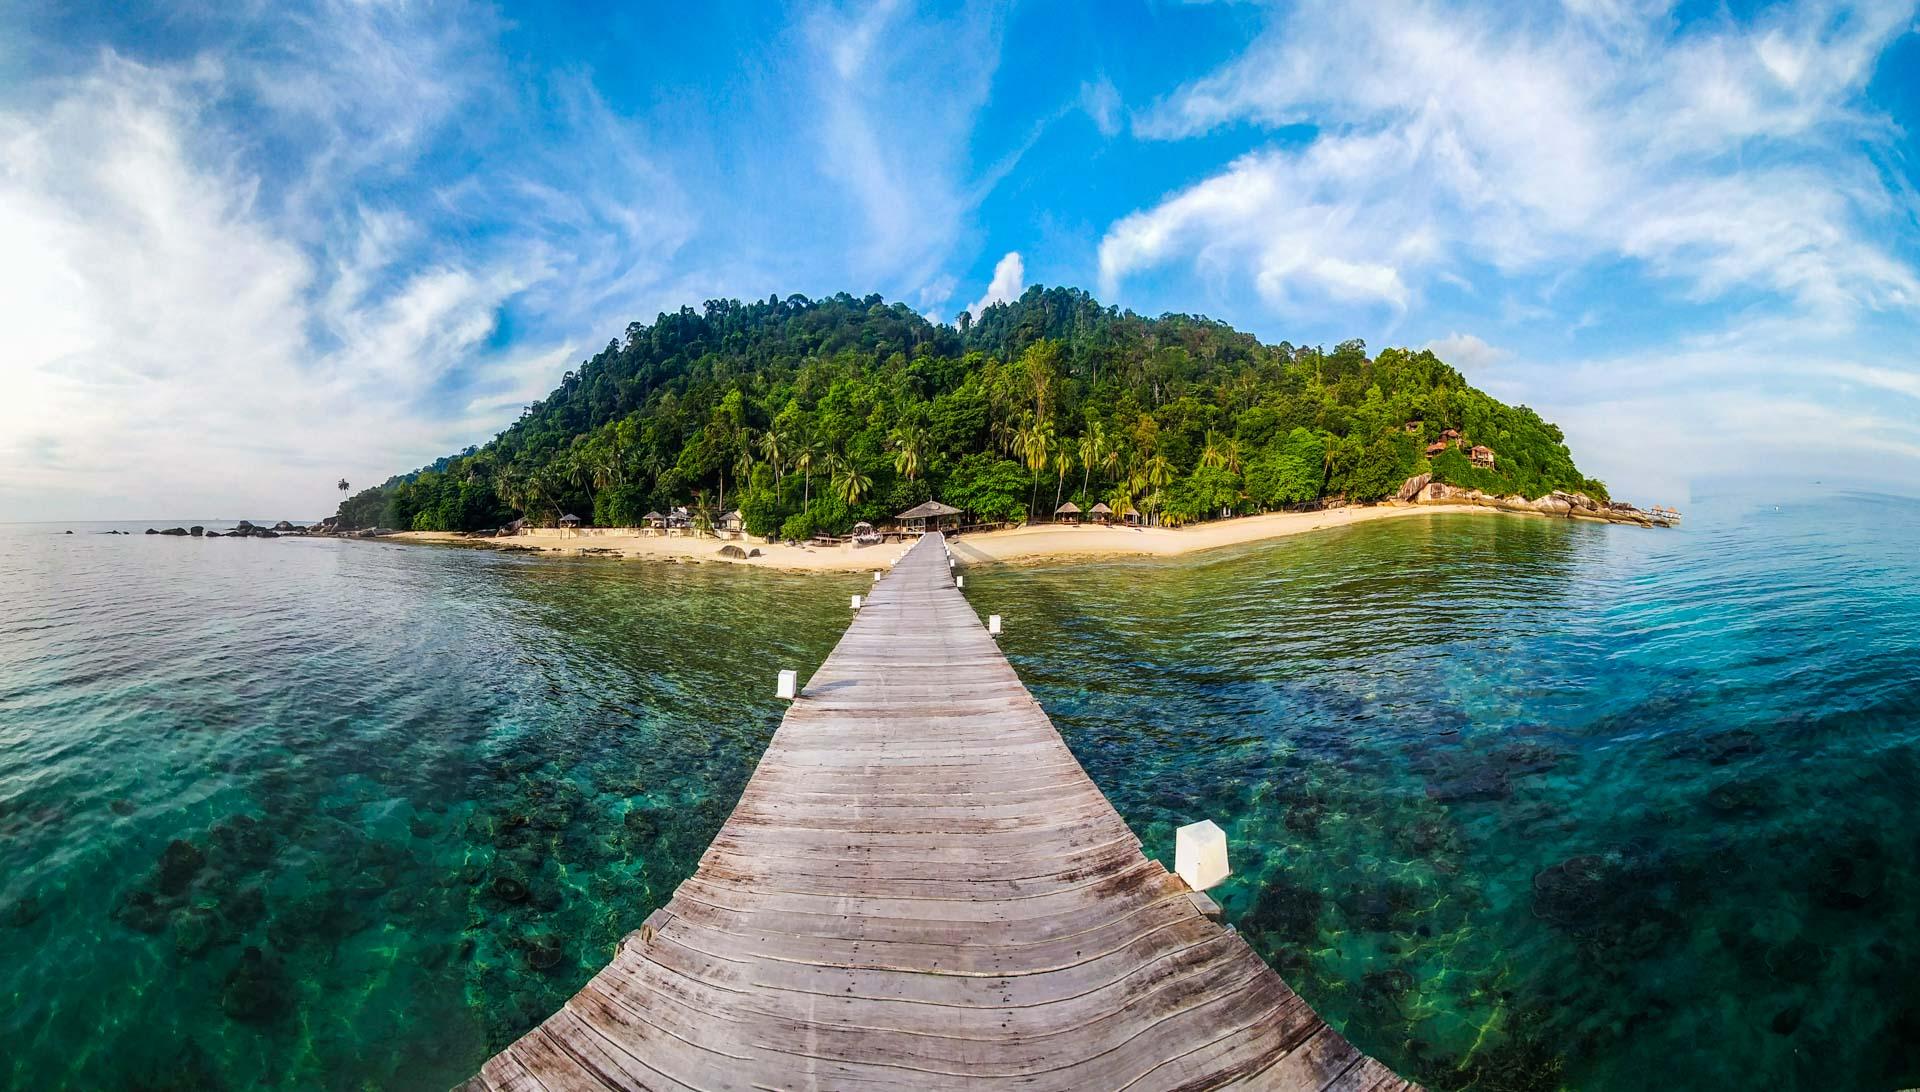 Tioman Island Malaysia Pescart Travel Photo Blog Enrico Pescantini japamala resort pier